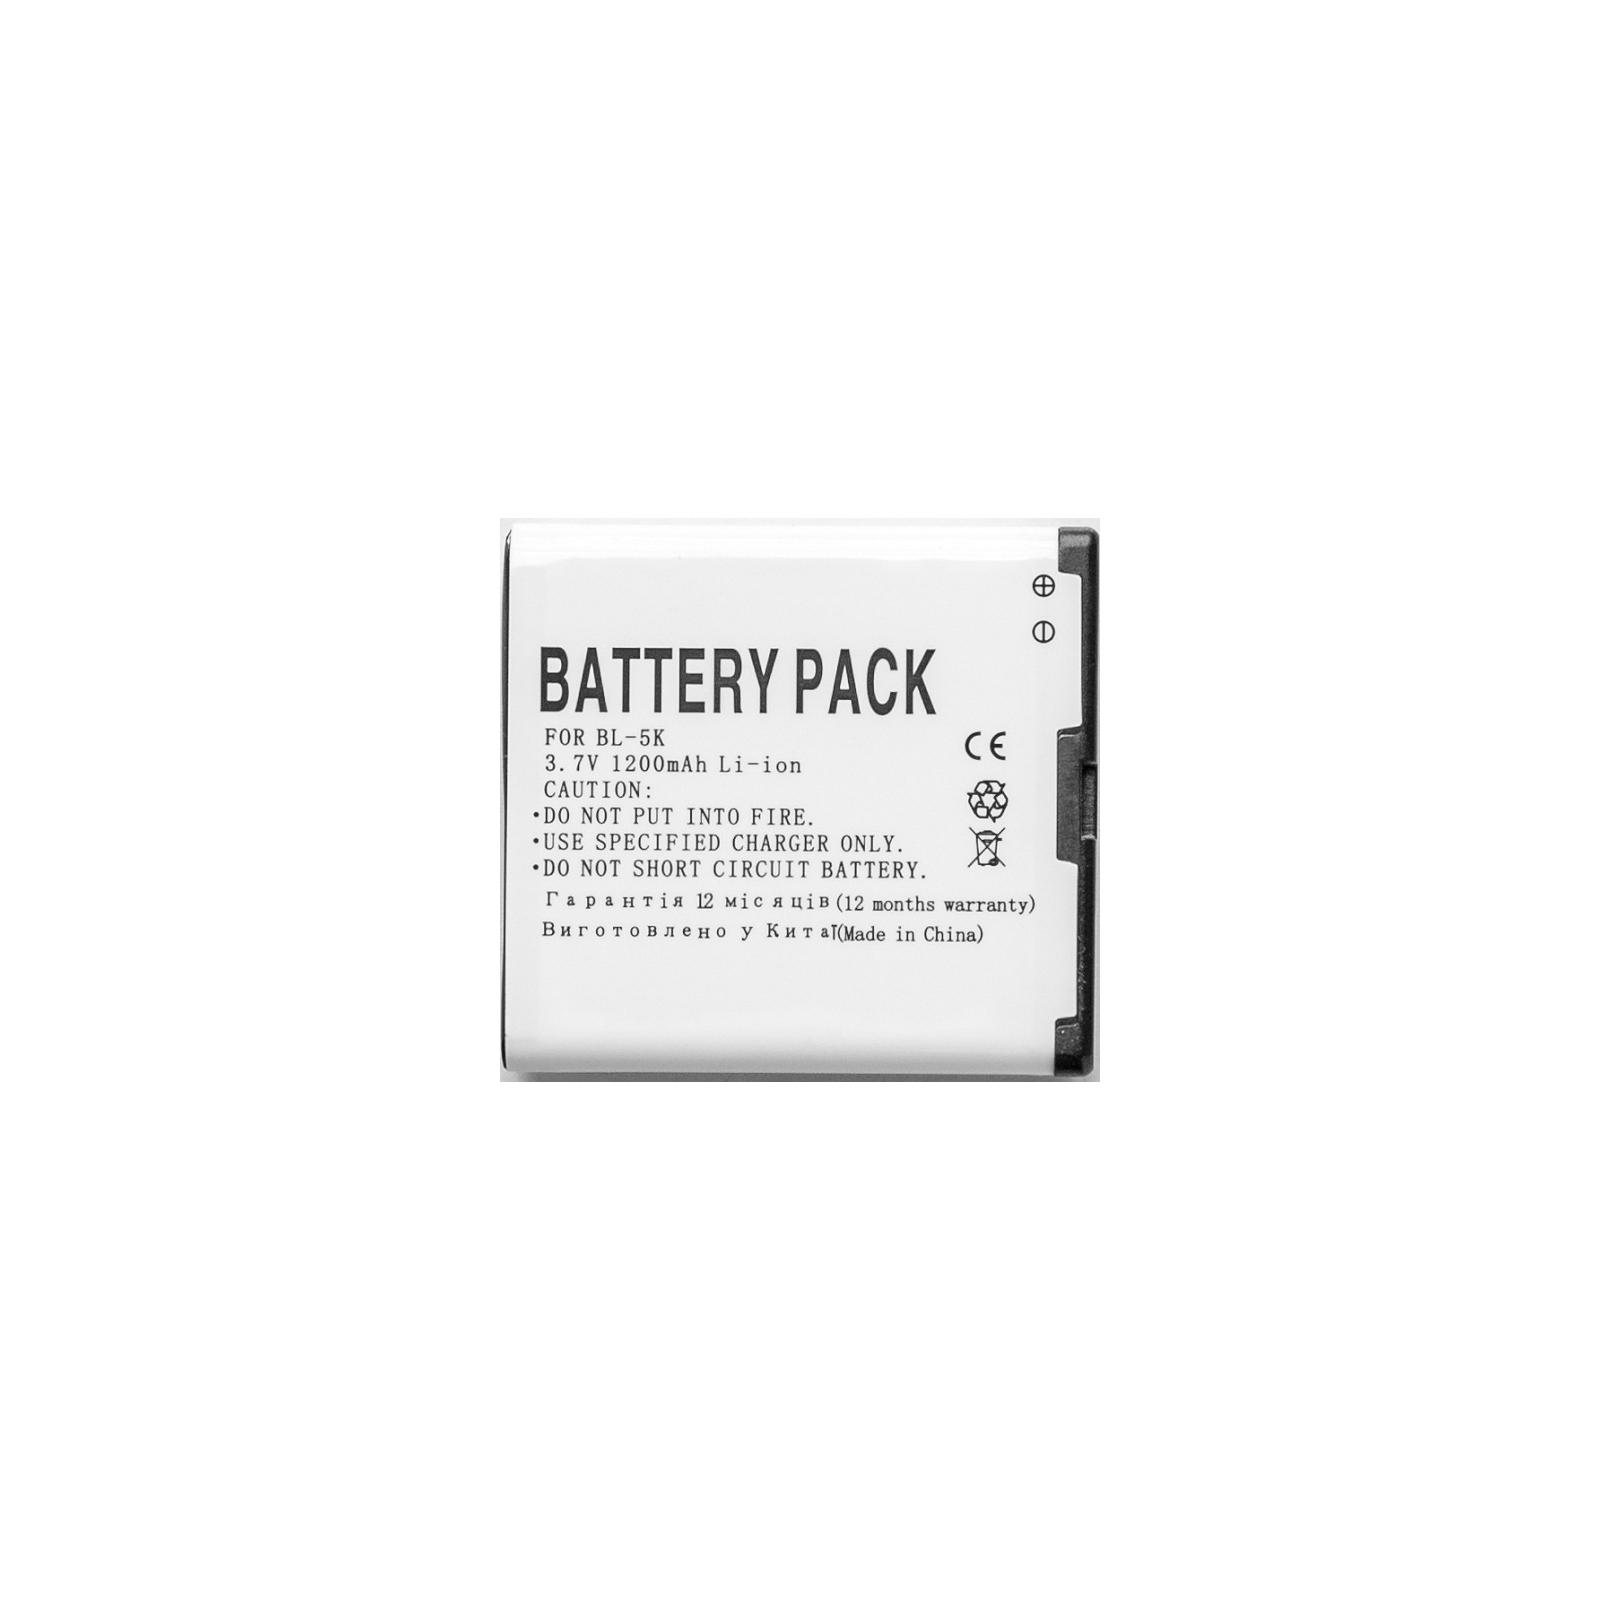 Аккумуляторная батарея PowerPlant Nokia BL-5K (C7, N85, N86) (DV00DV6035) изображение 2